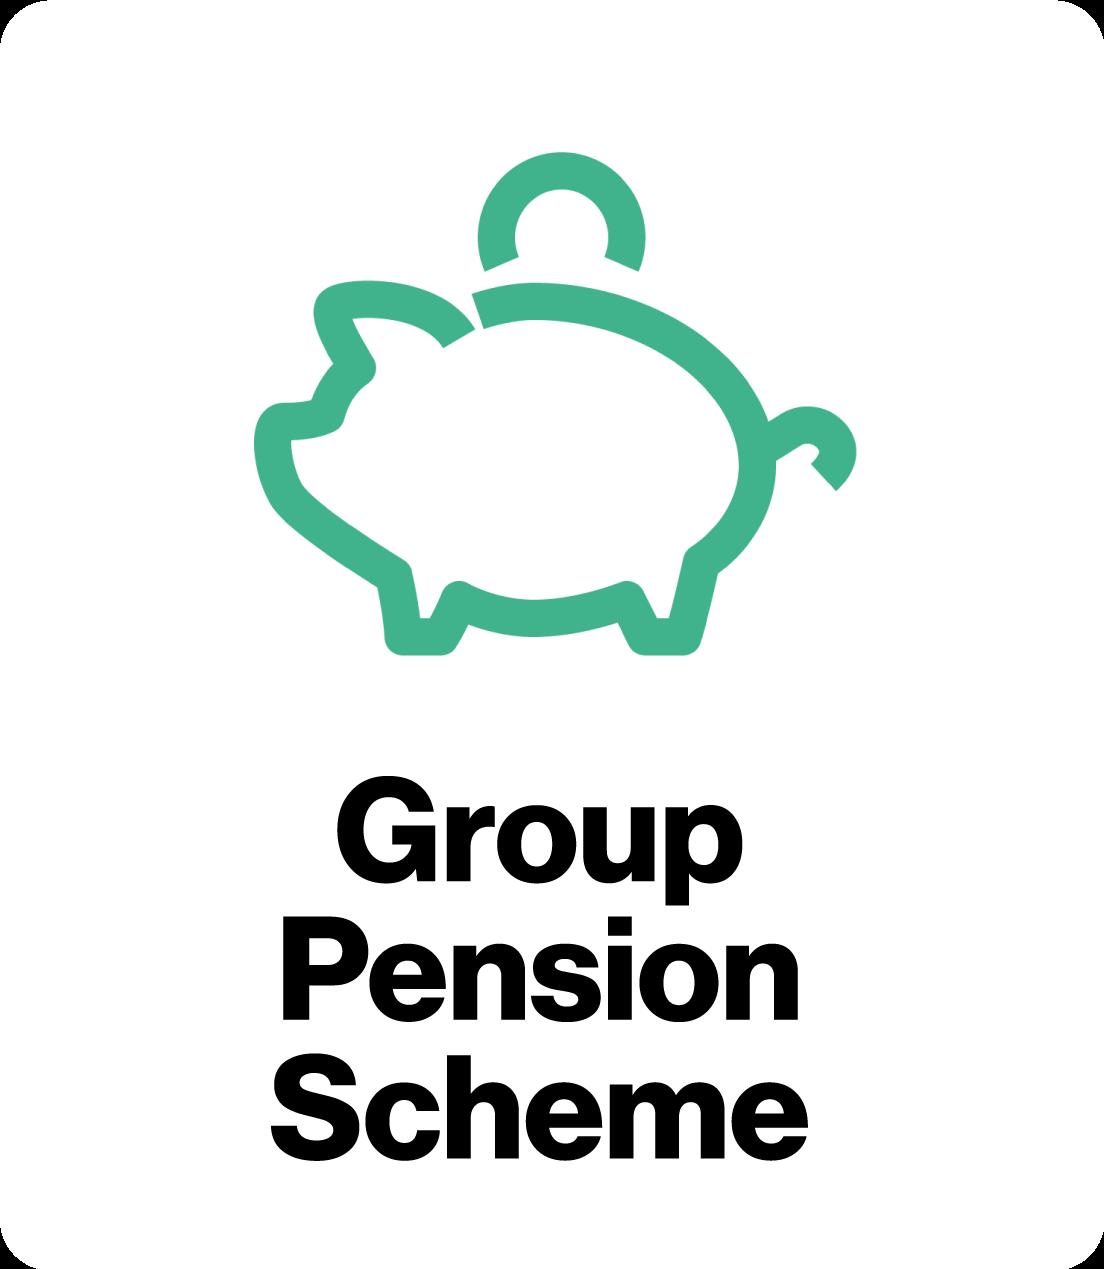 Group Pension Scheme